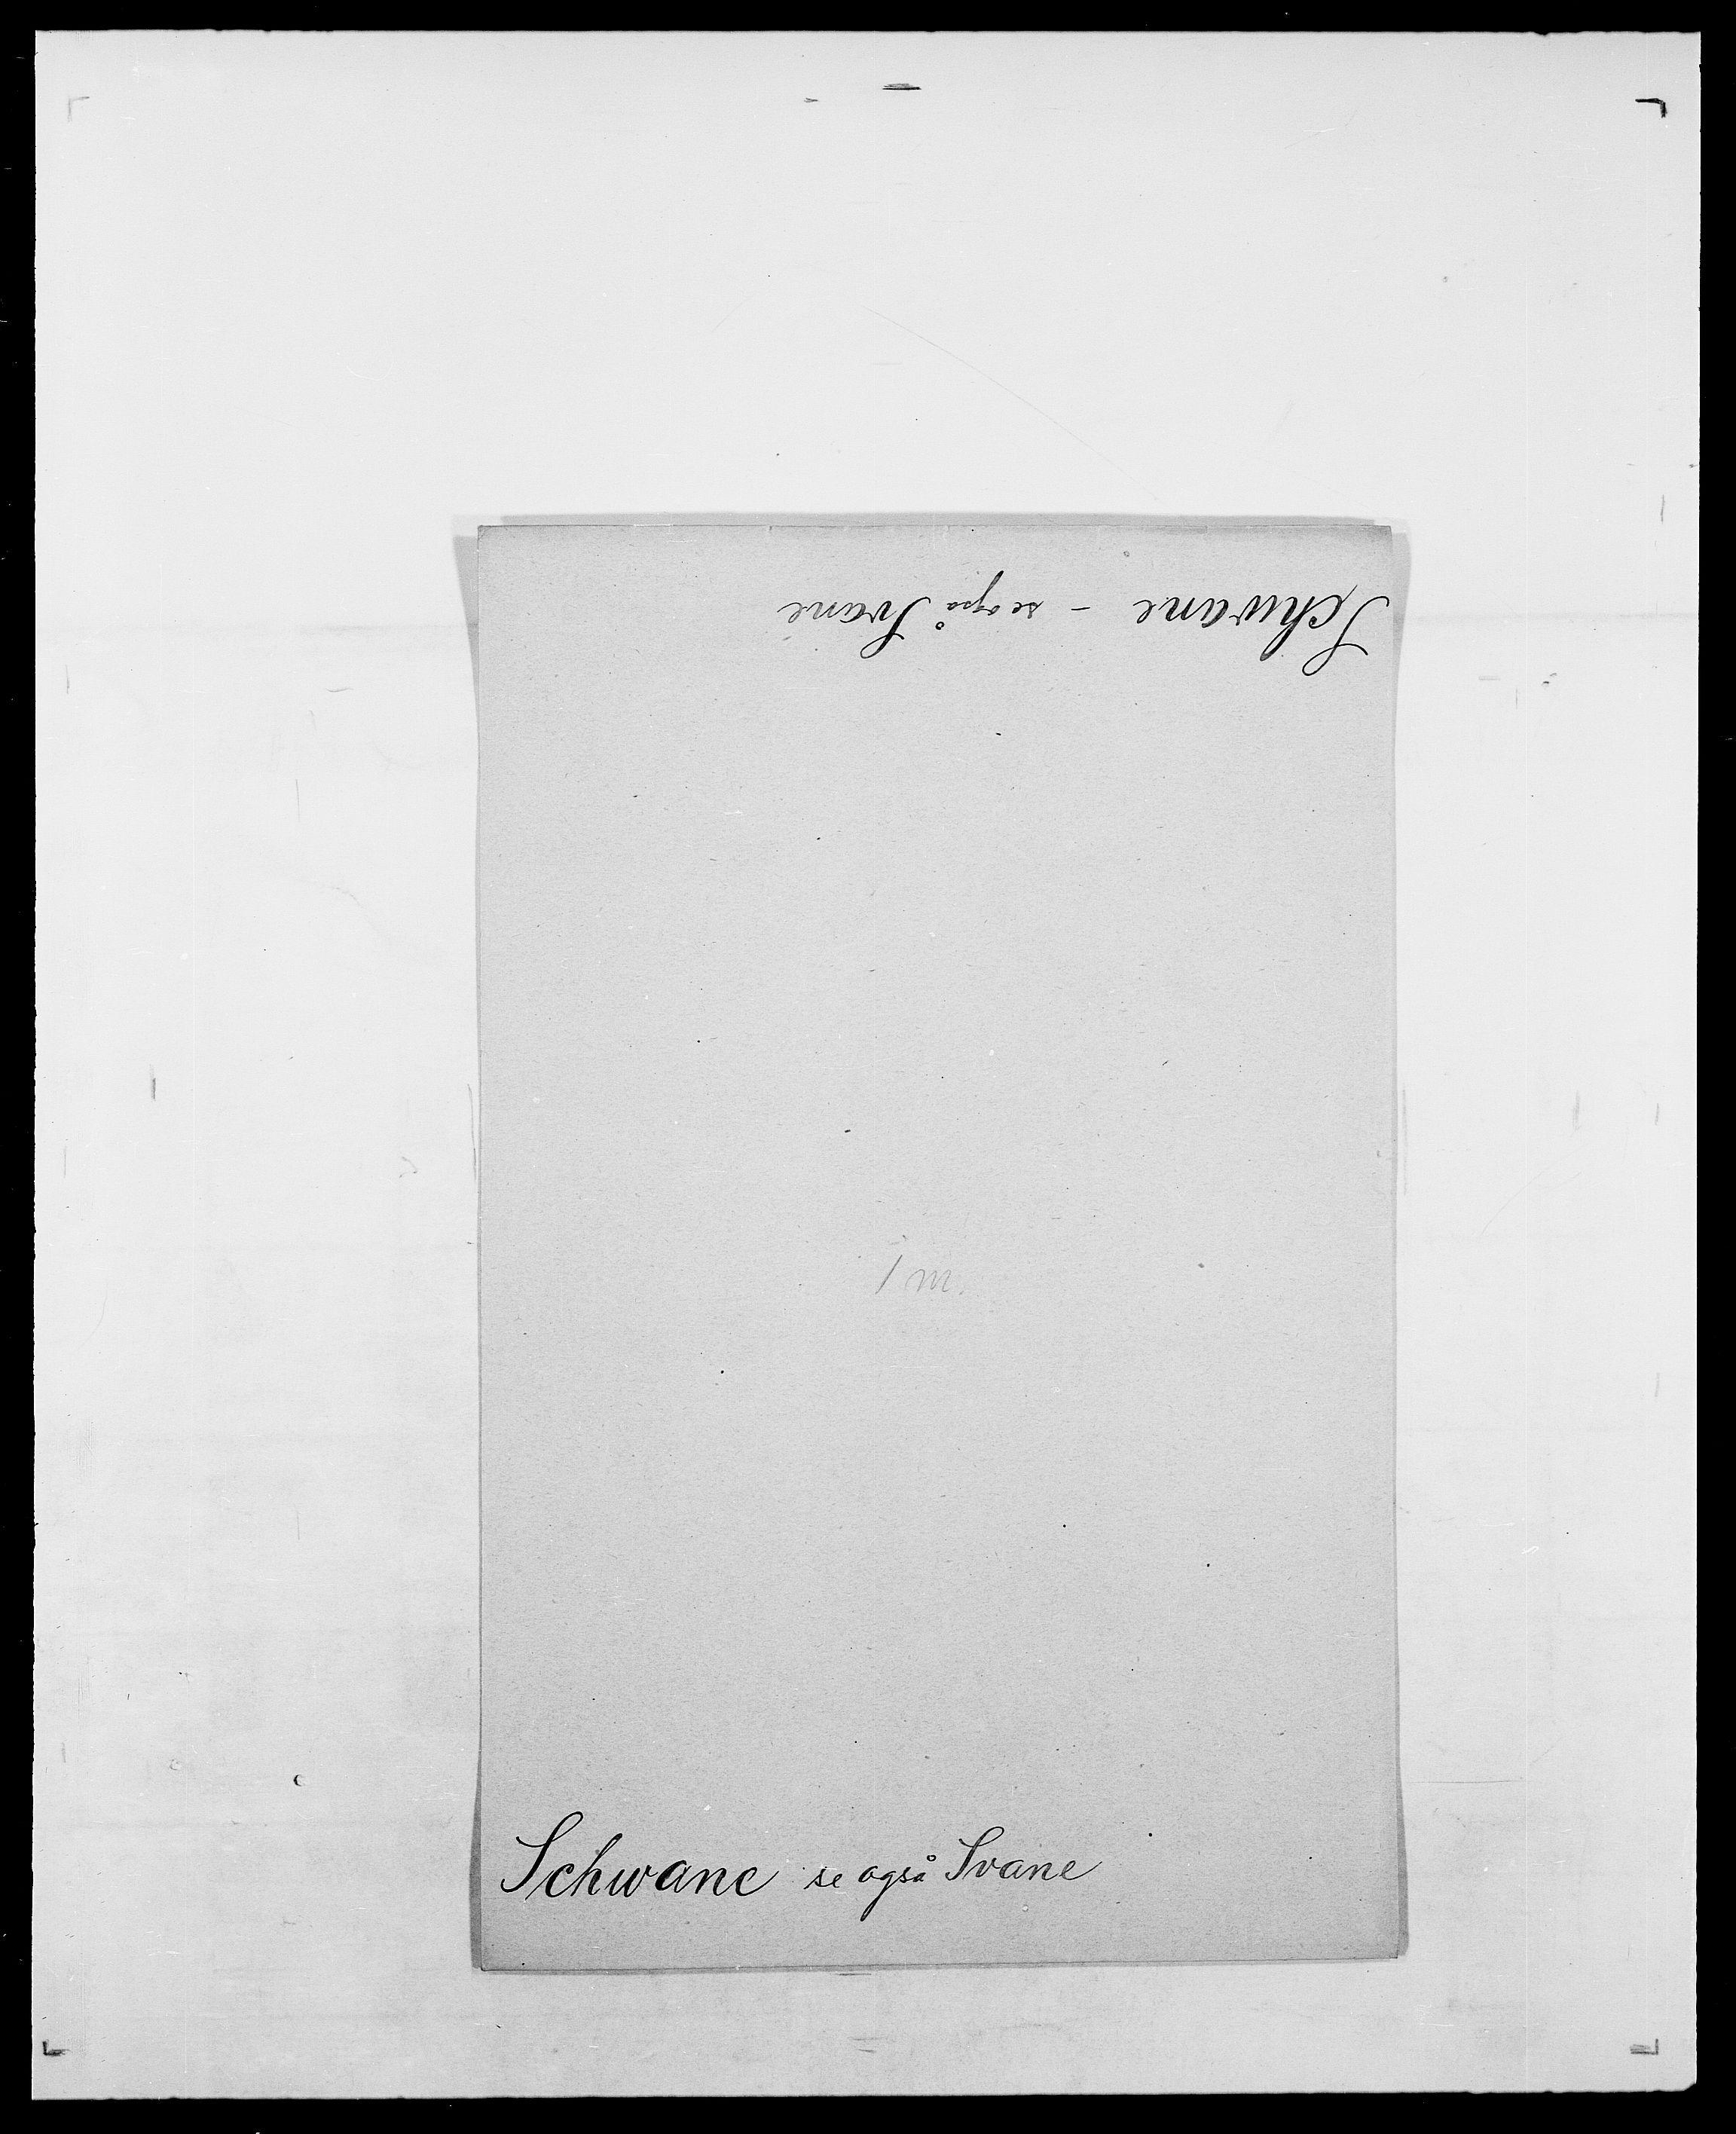 SAO, Delgobe, Charles Antoine - samling, D/Da/L0035: Schnabel - sjetman, s. 371